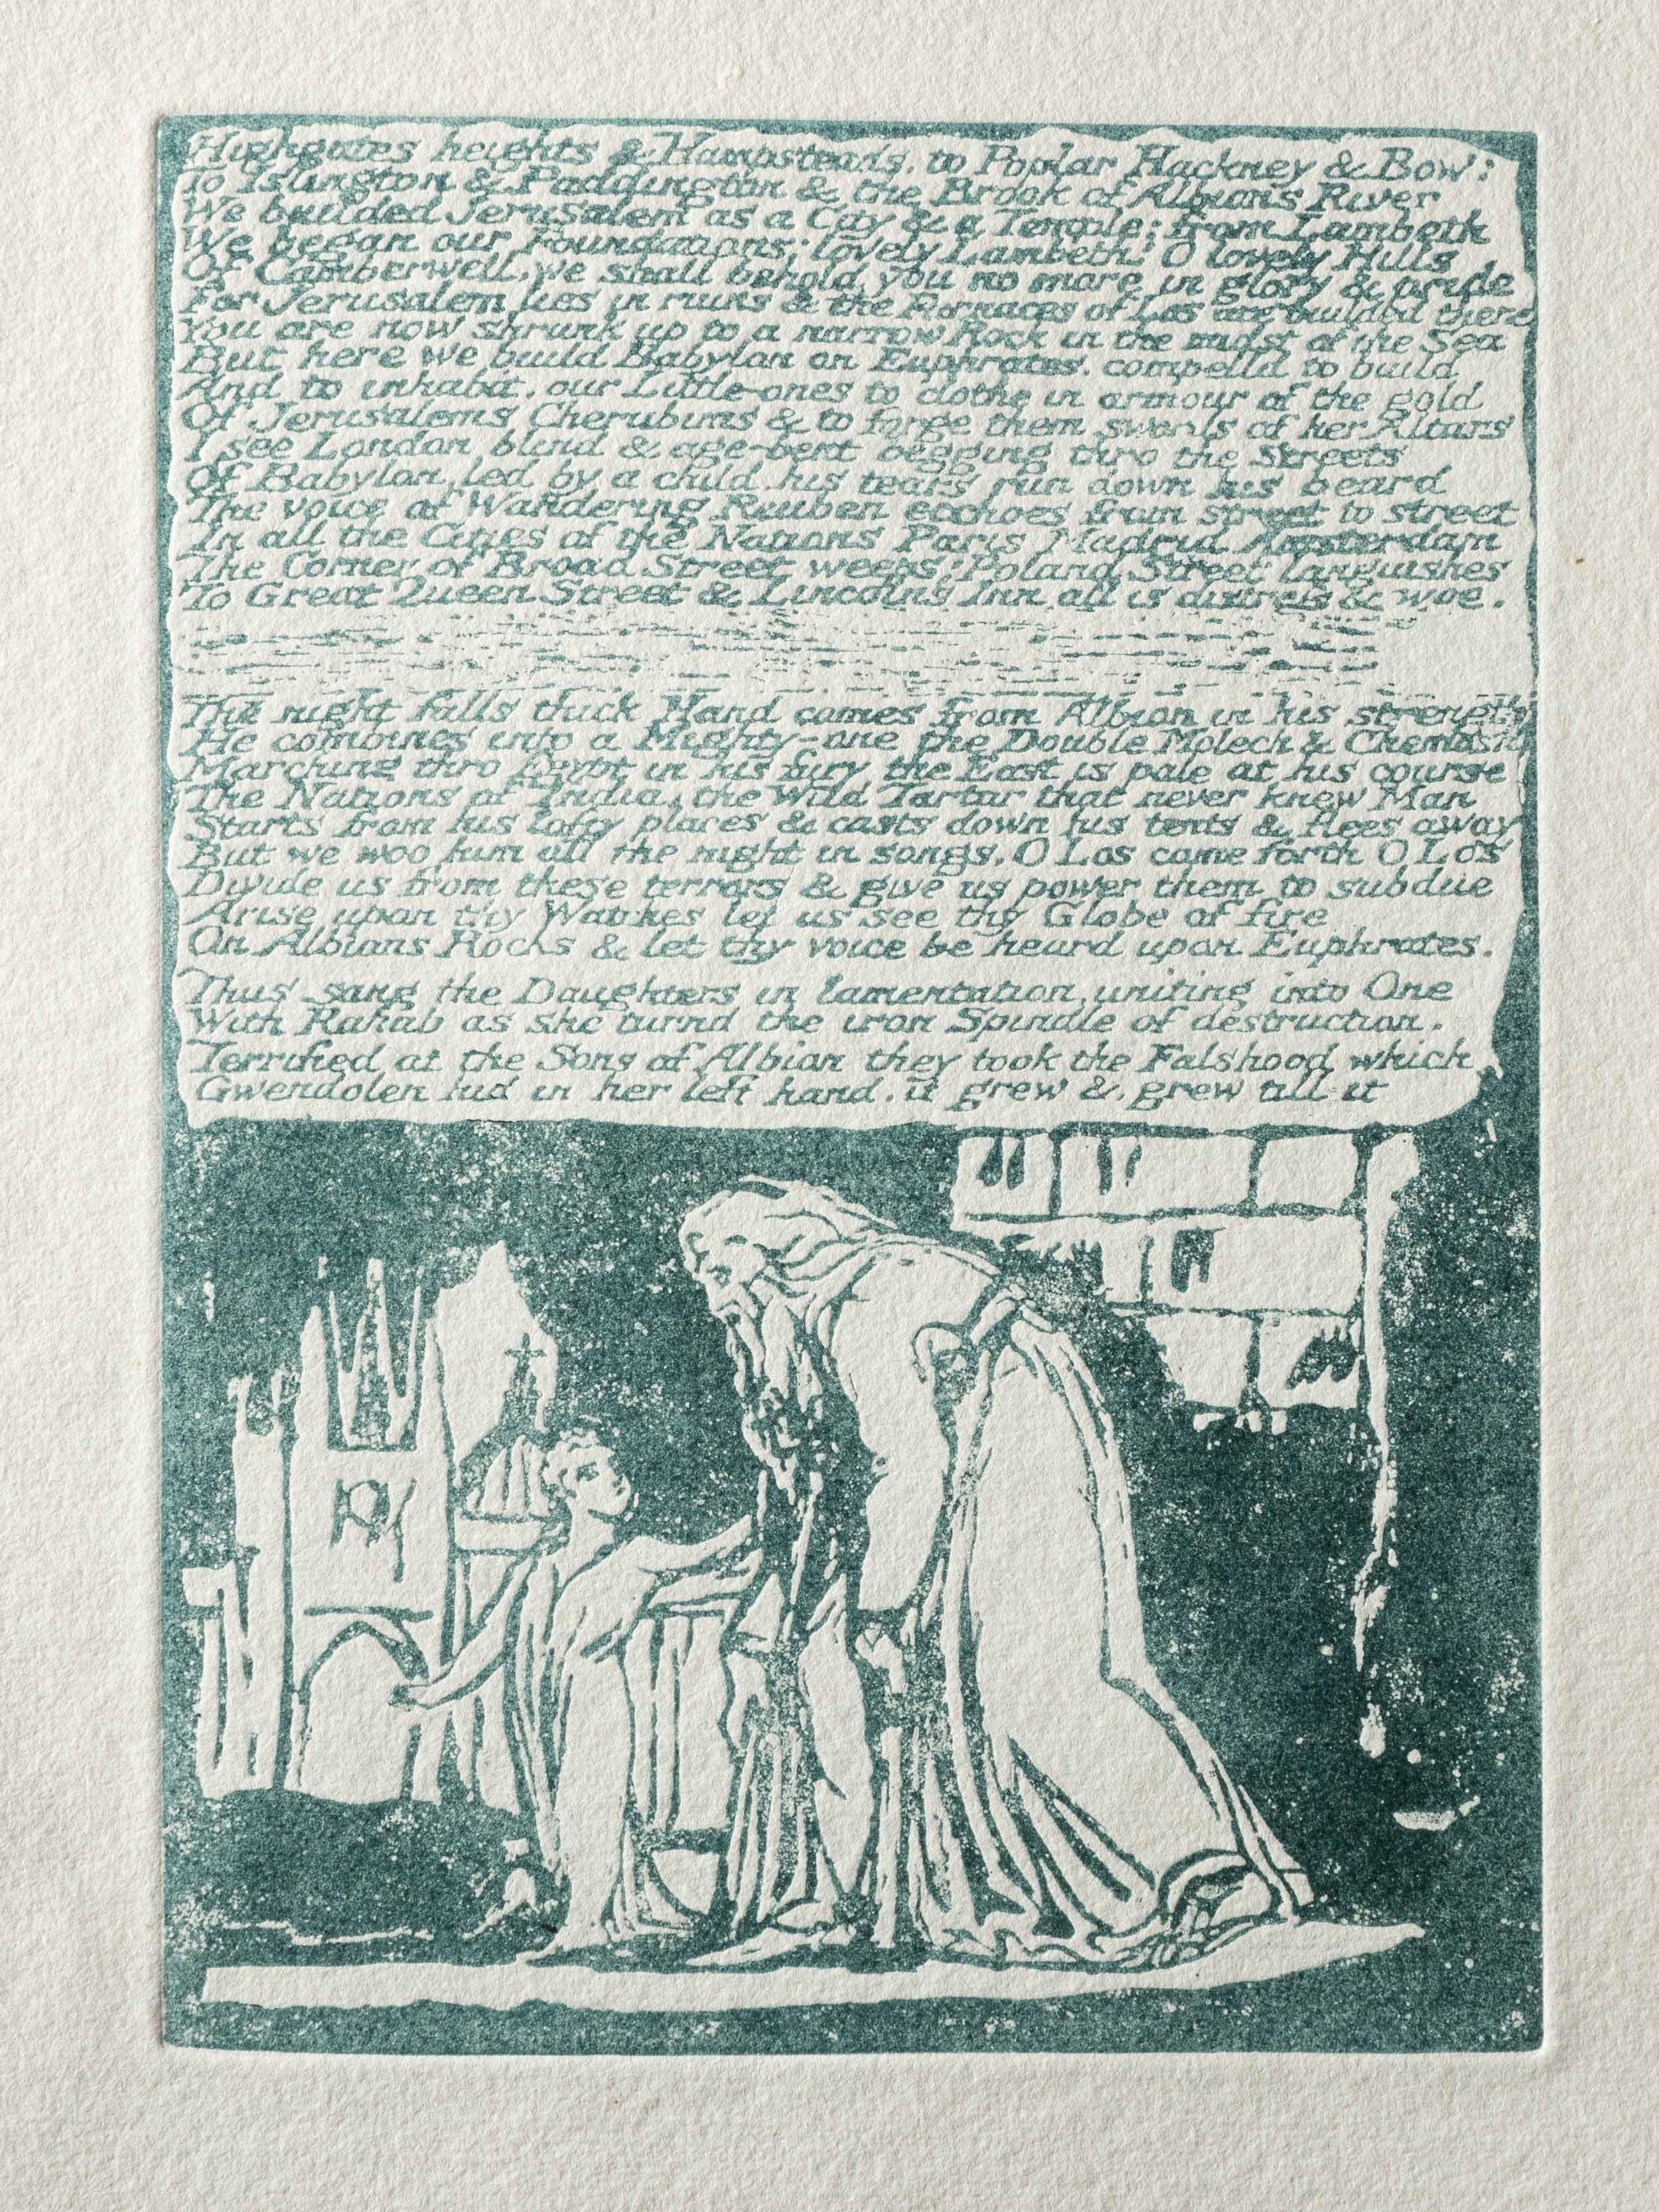 William-Blake-Jerusalem-Plate-84,-Highgates-heights-&-Hampsteads.jpg